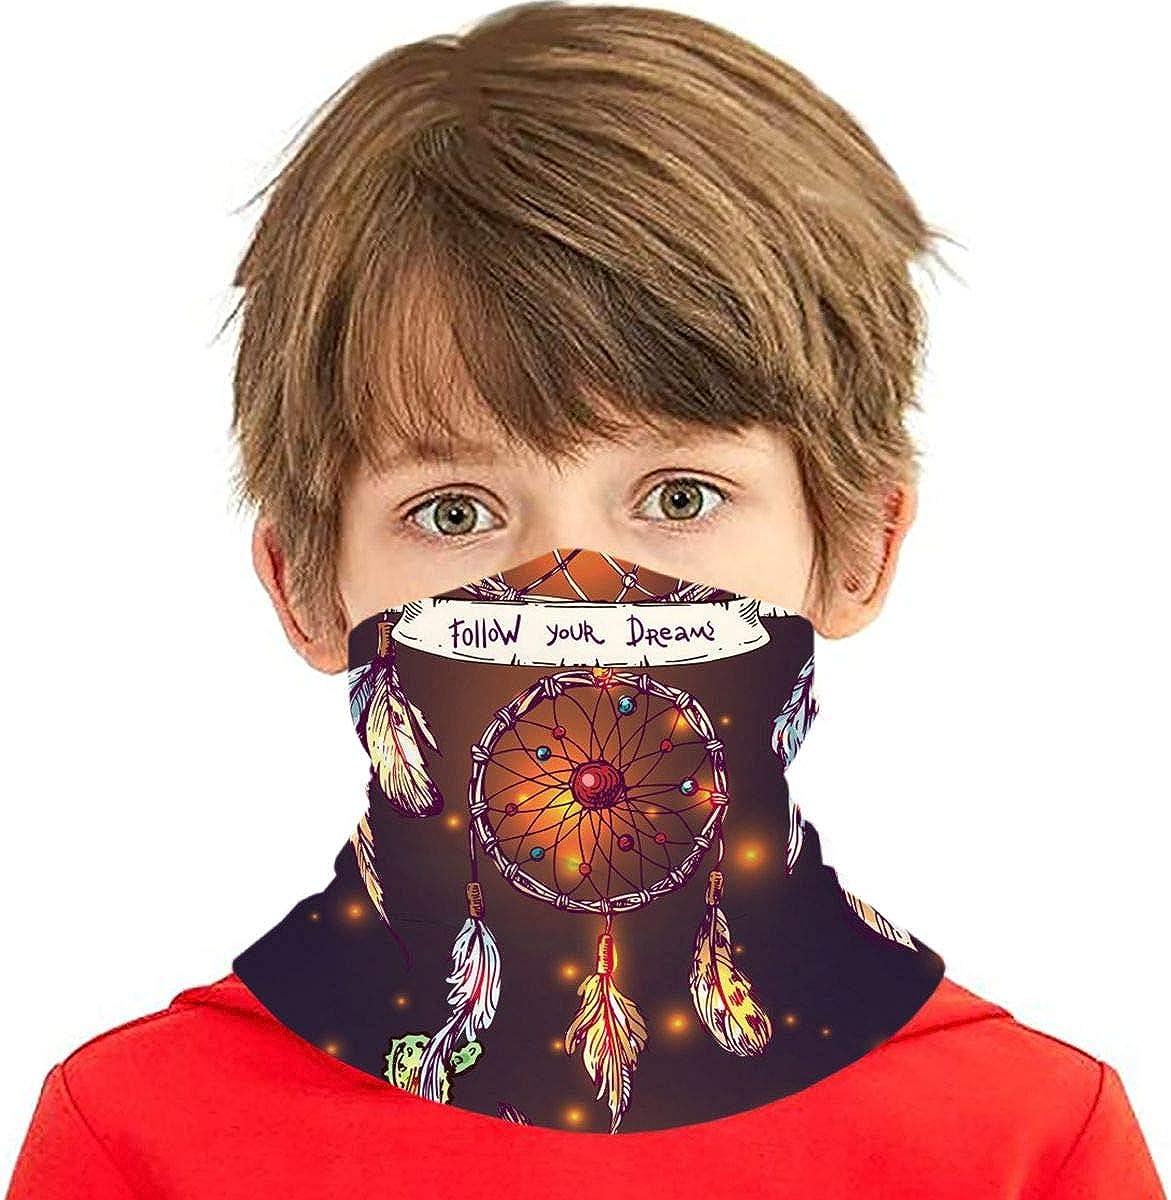 Dujiea Kids Bandanas Face Mask, Dreamcatcher Cactus Dust Sun UV Protection Neck Gaiter Multifunctional Balaclava Face Scarf Summer Tube Headband Lightweight for Boys Girls Outdoors